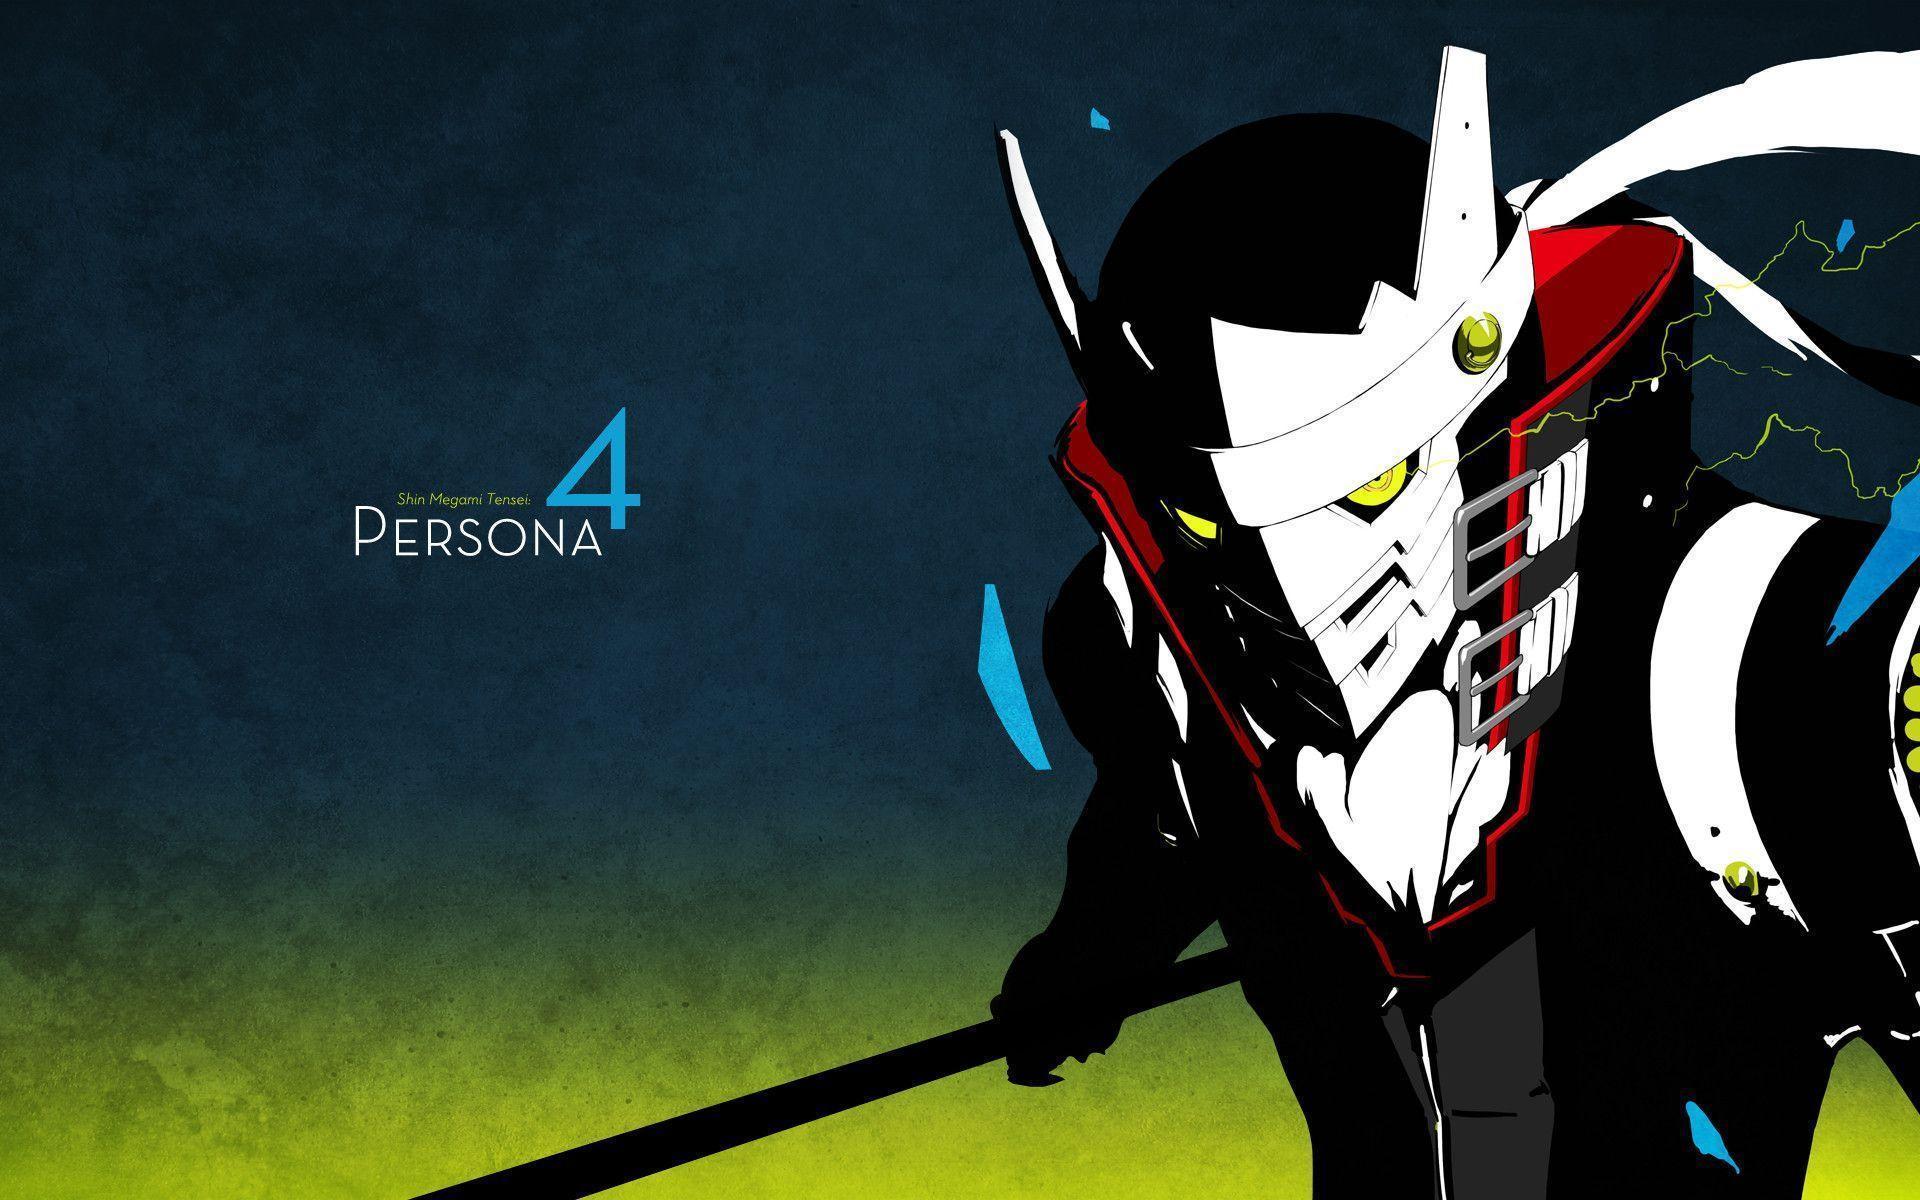 Persona 4 Wallpapers - Wallpaper Cave